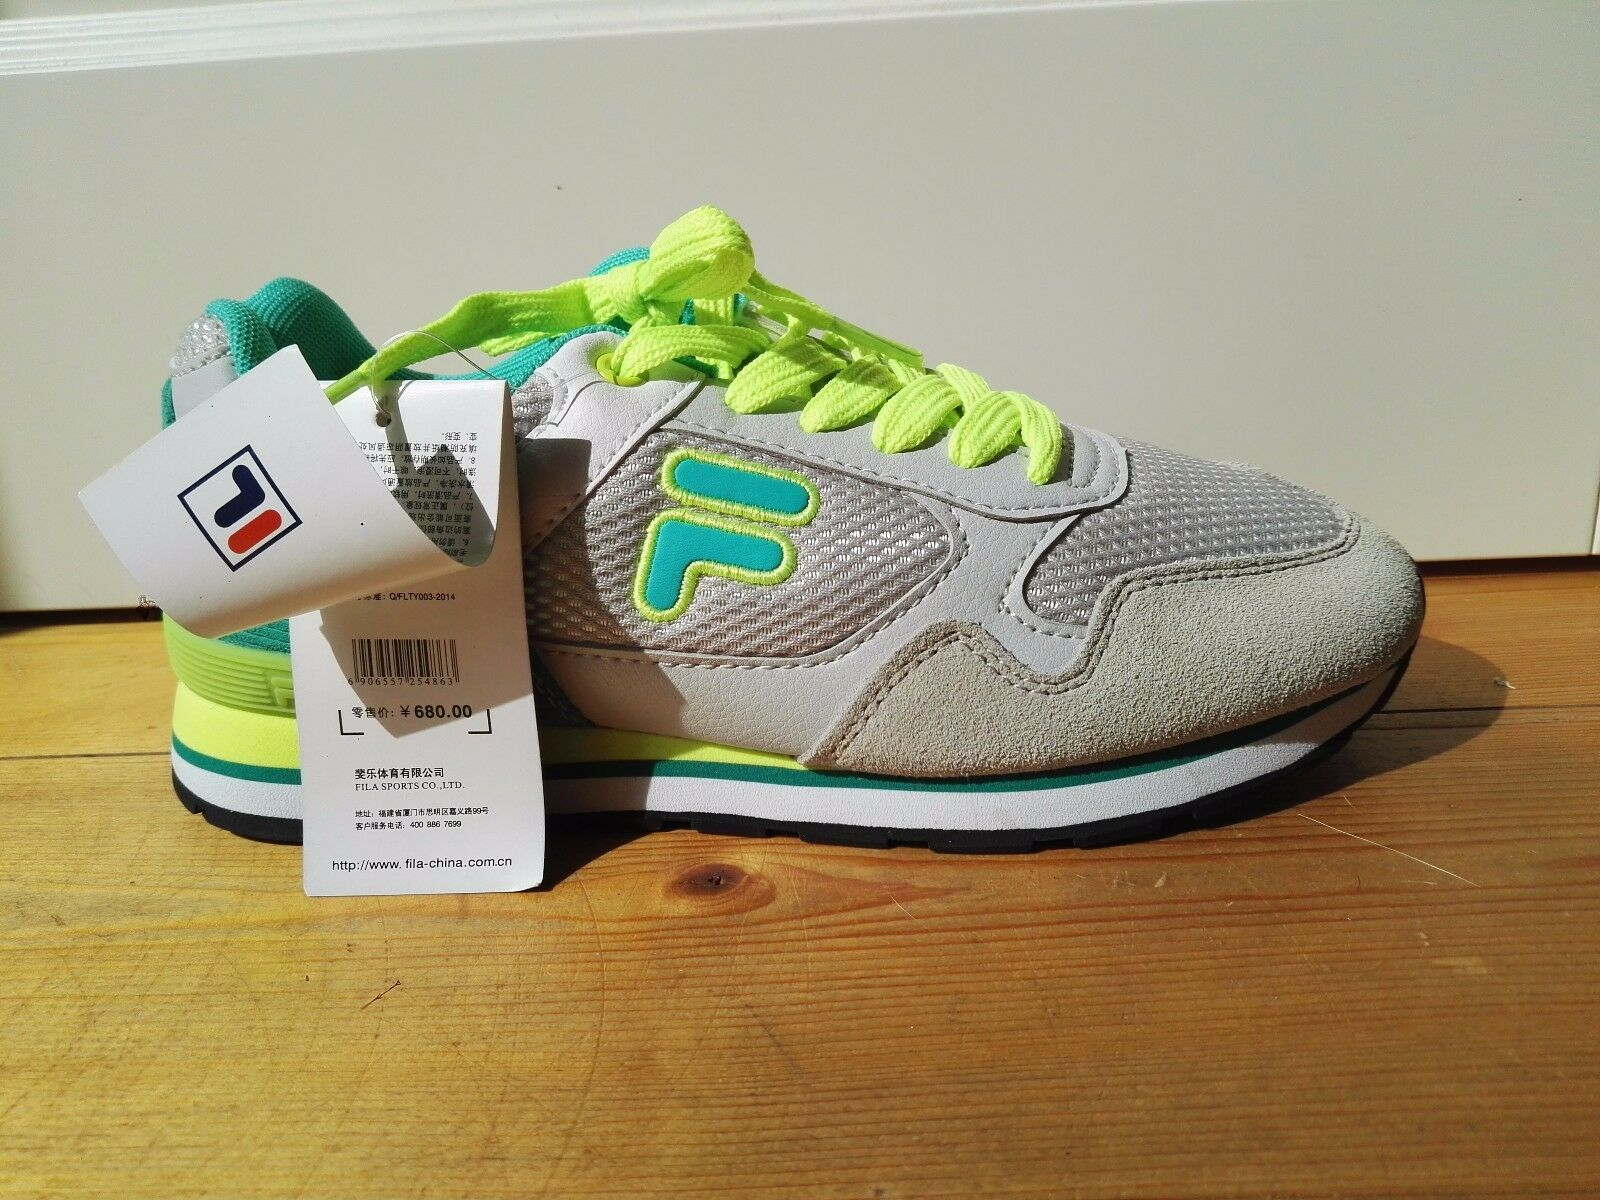 Nike Air 95 303 749766 270 grün Turnschuhe Schuhe Gr.44